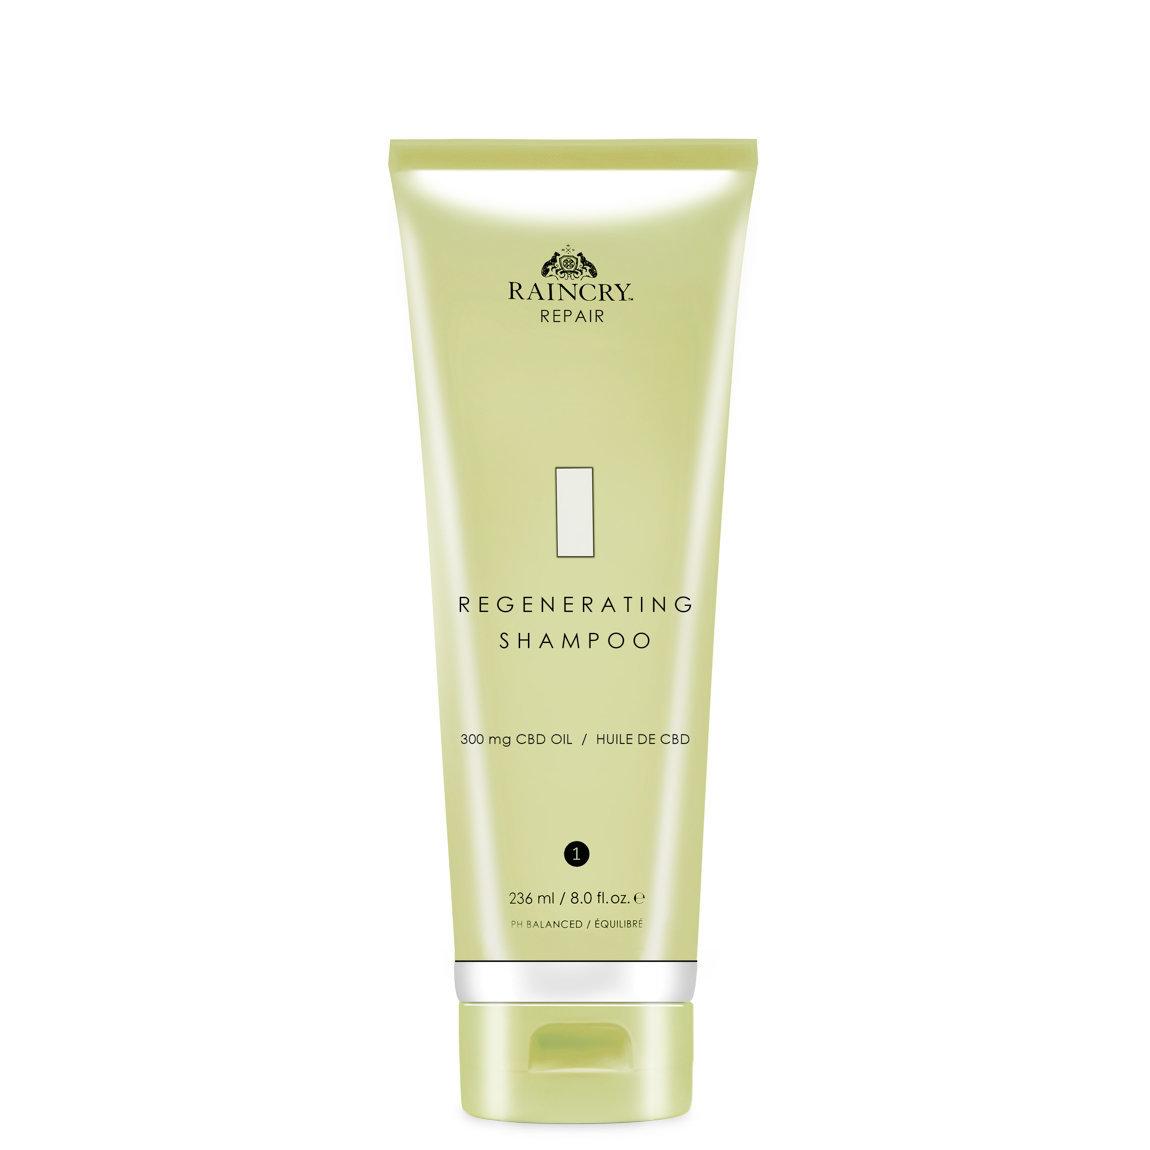 Raincry Regenerating Shampoo product swatch.